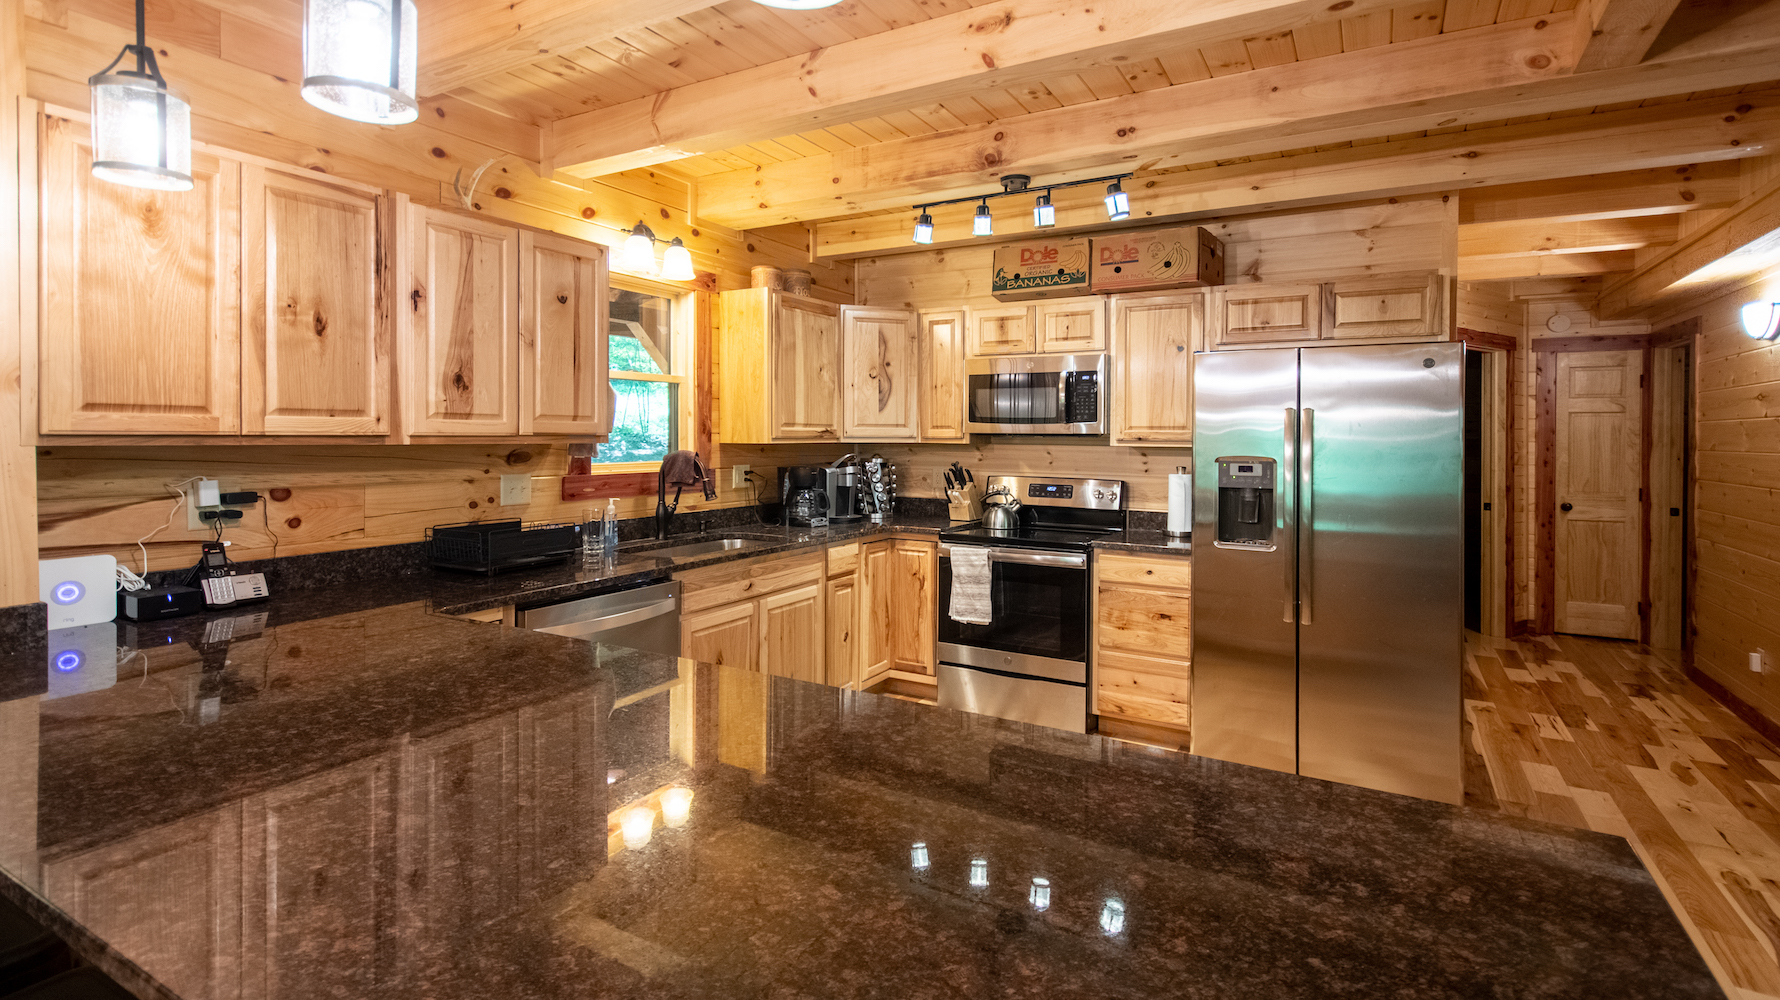 AHL Kitchen - AHL Kitchen